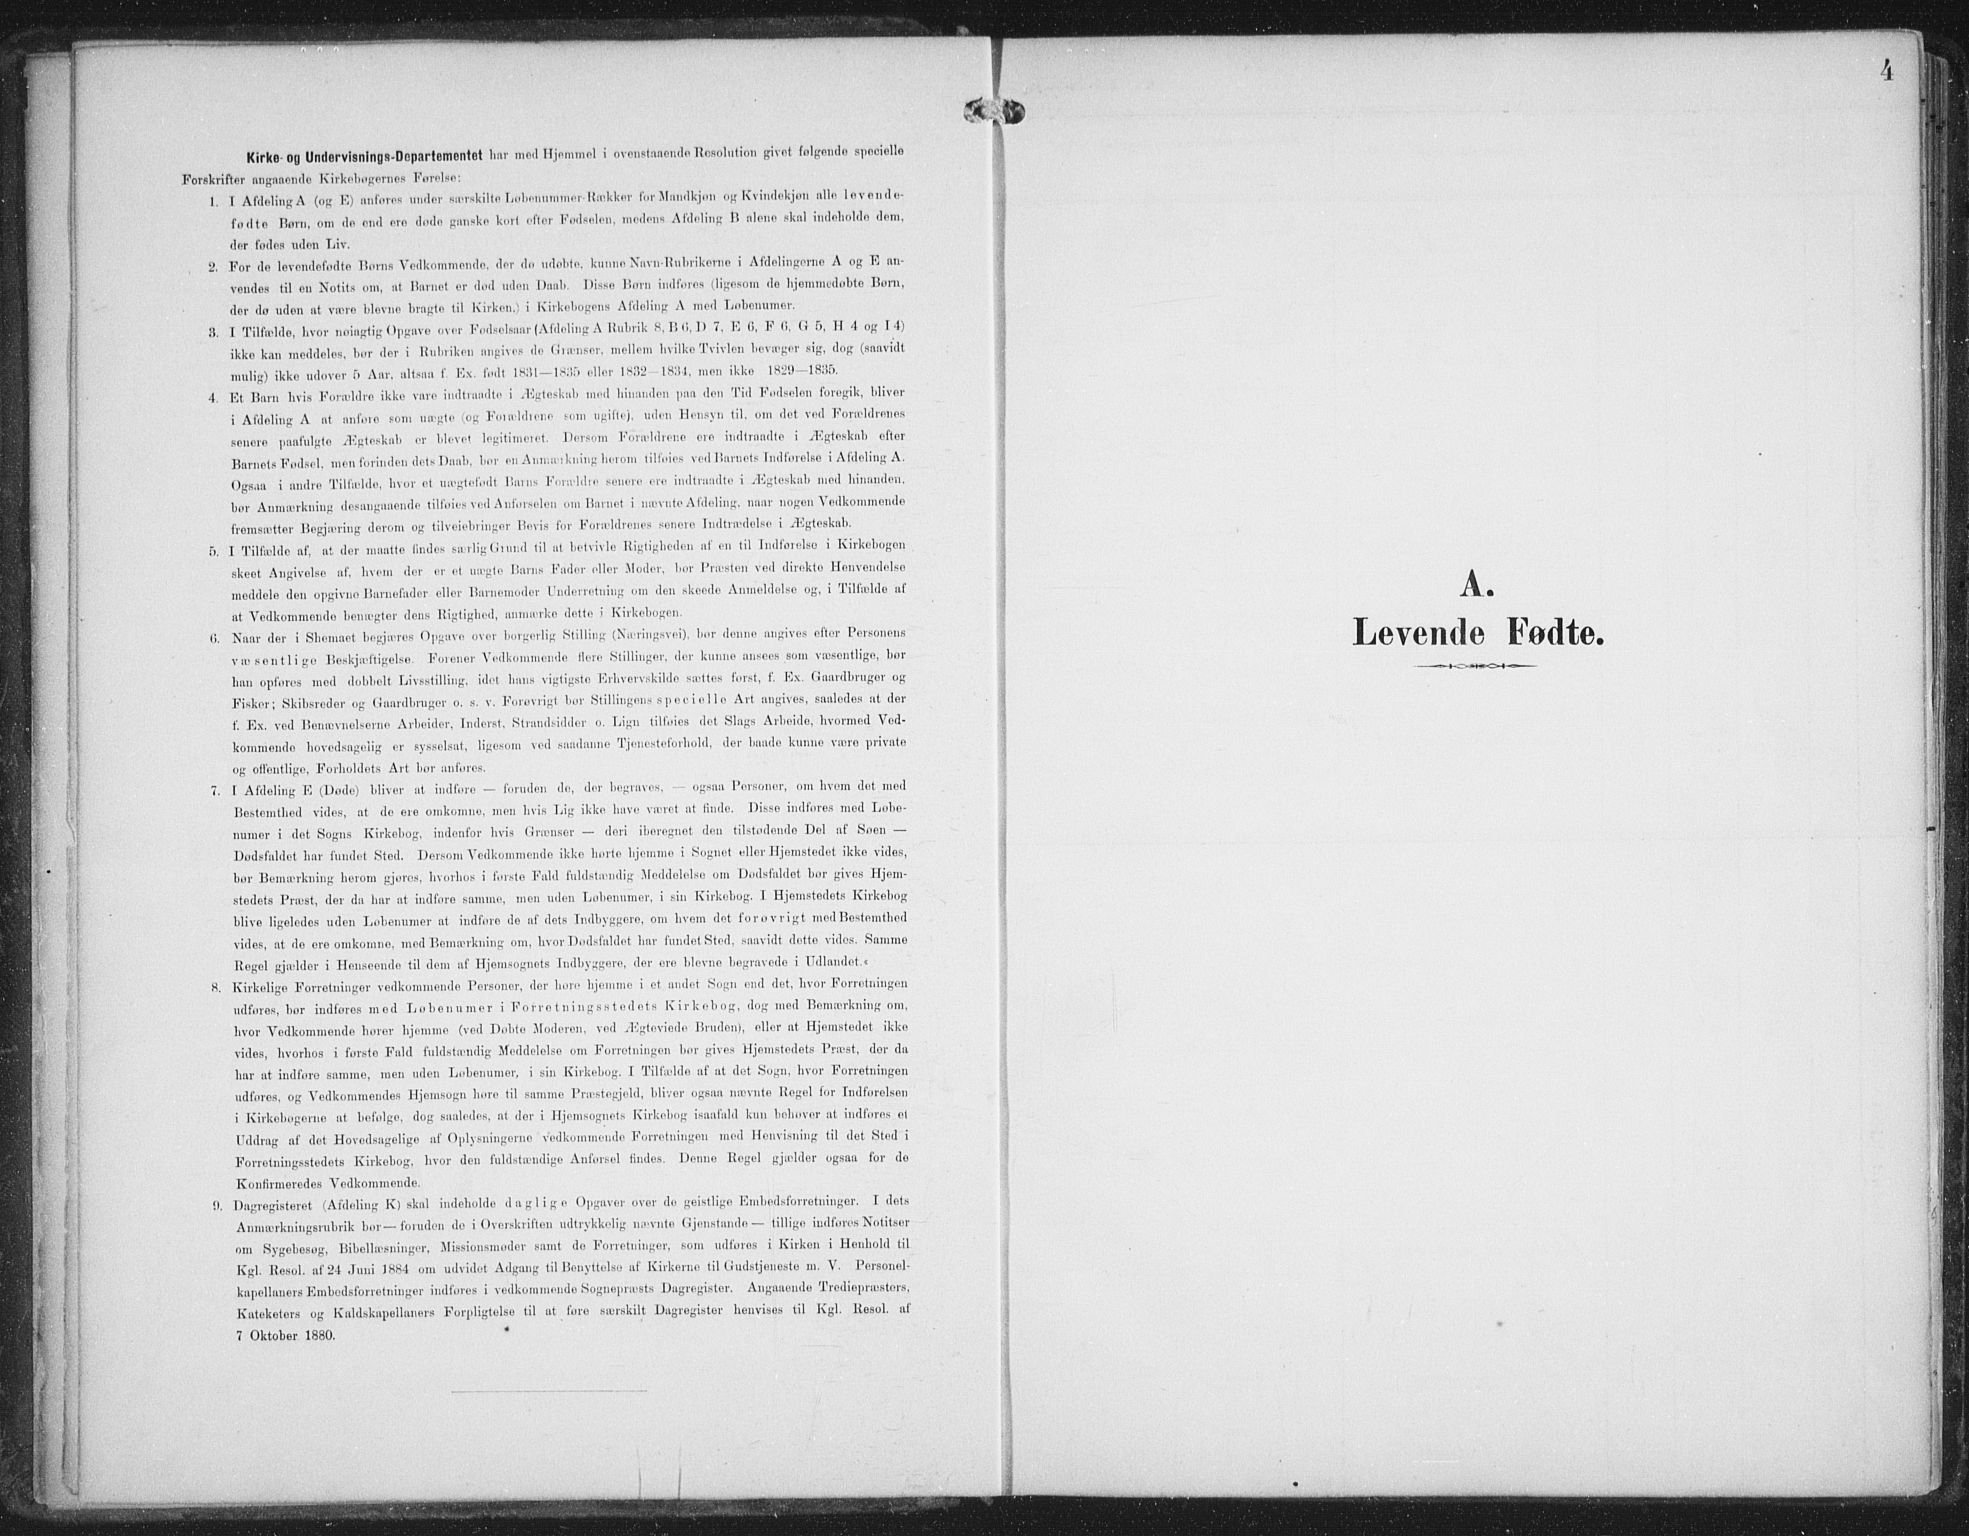 SATØ, Lenvik sokneprestembete, H/Ha: Ministerialbok nr. 15, 1896-1915, s. 4